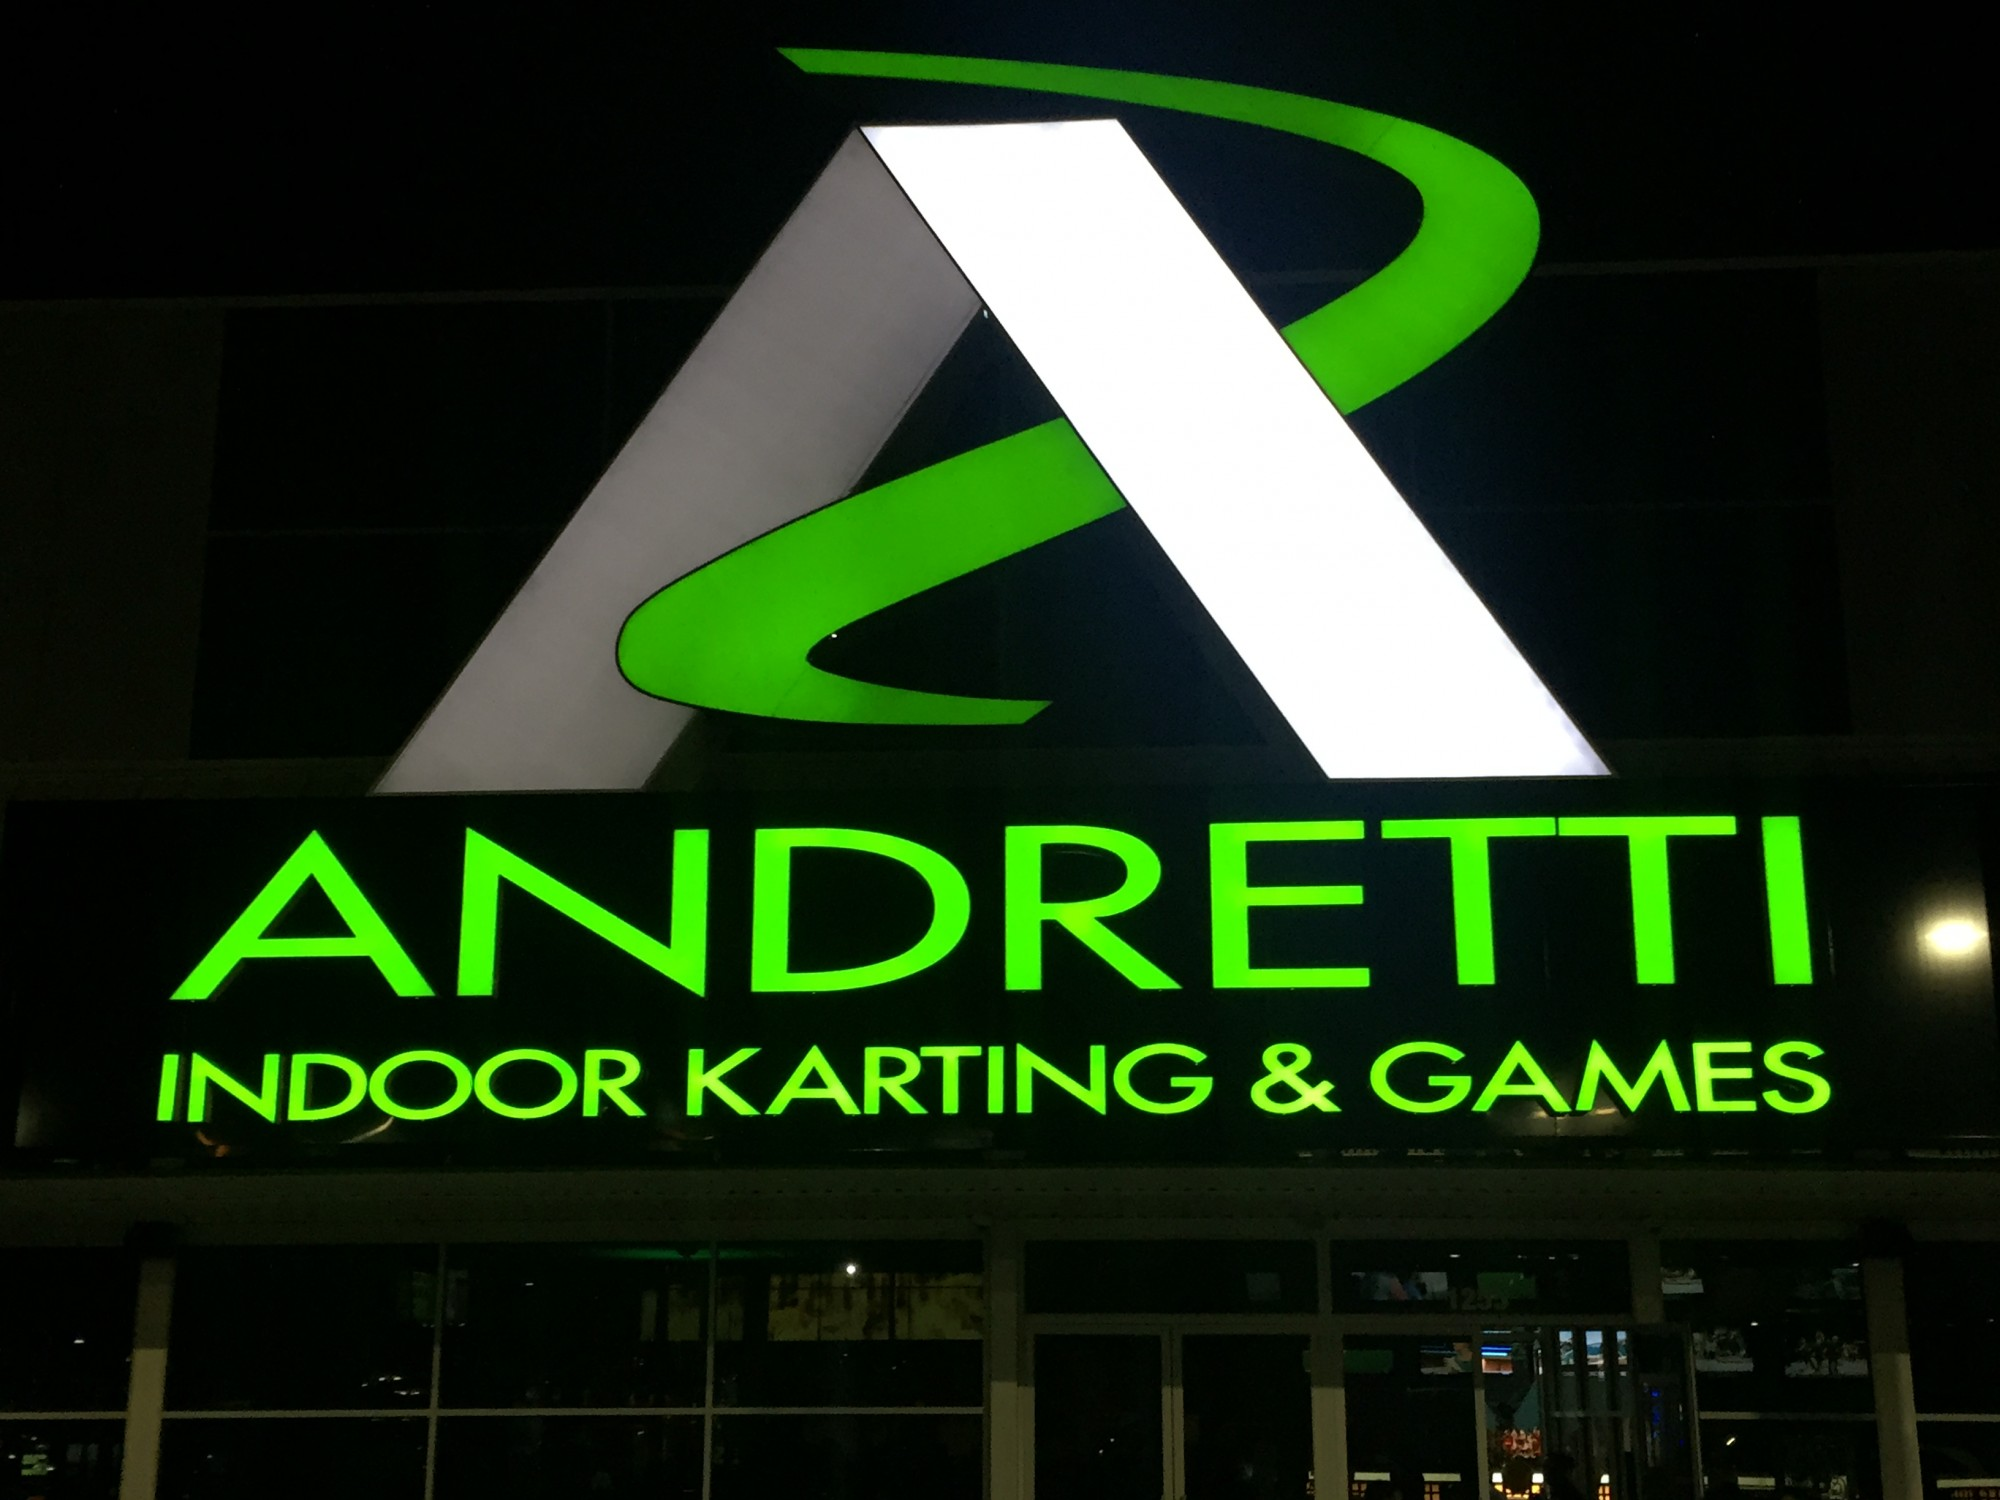 Andretti Indoor Karting & Games - Marietta, GA - CCS Image ...